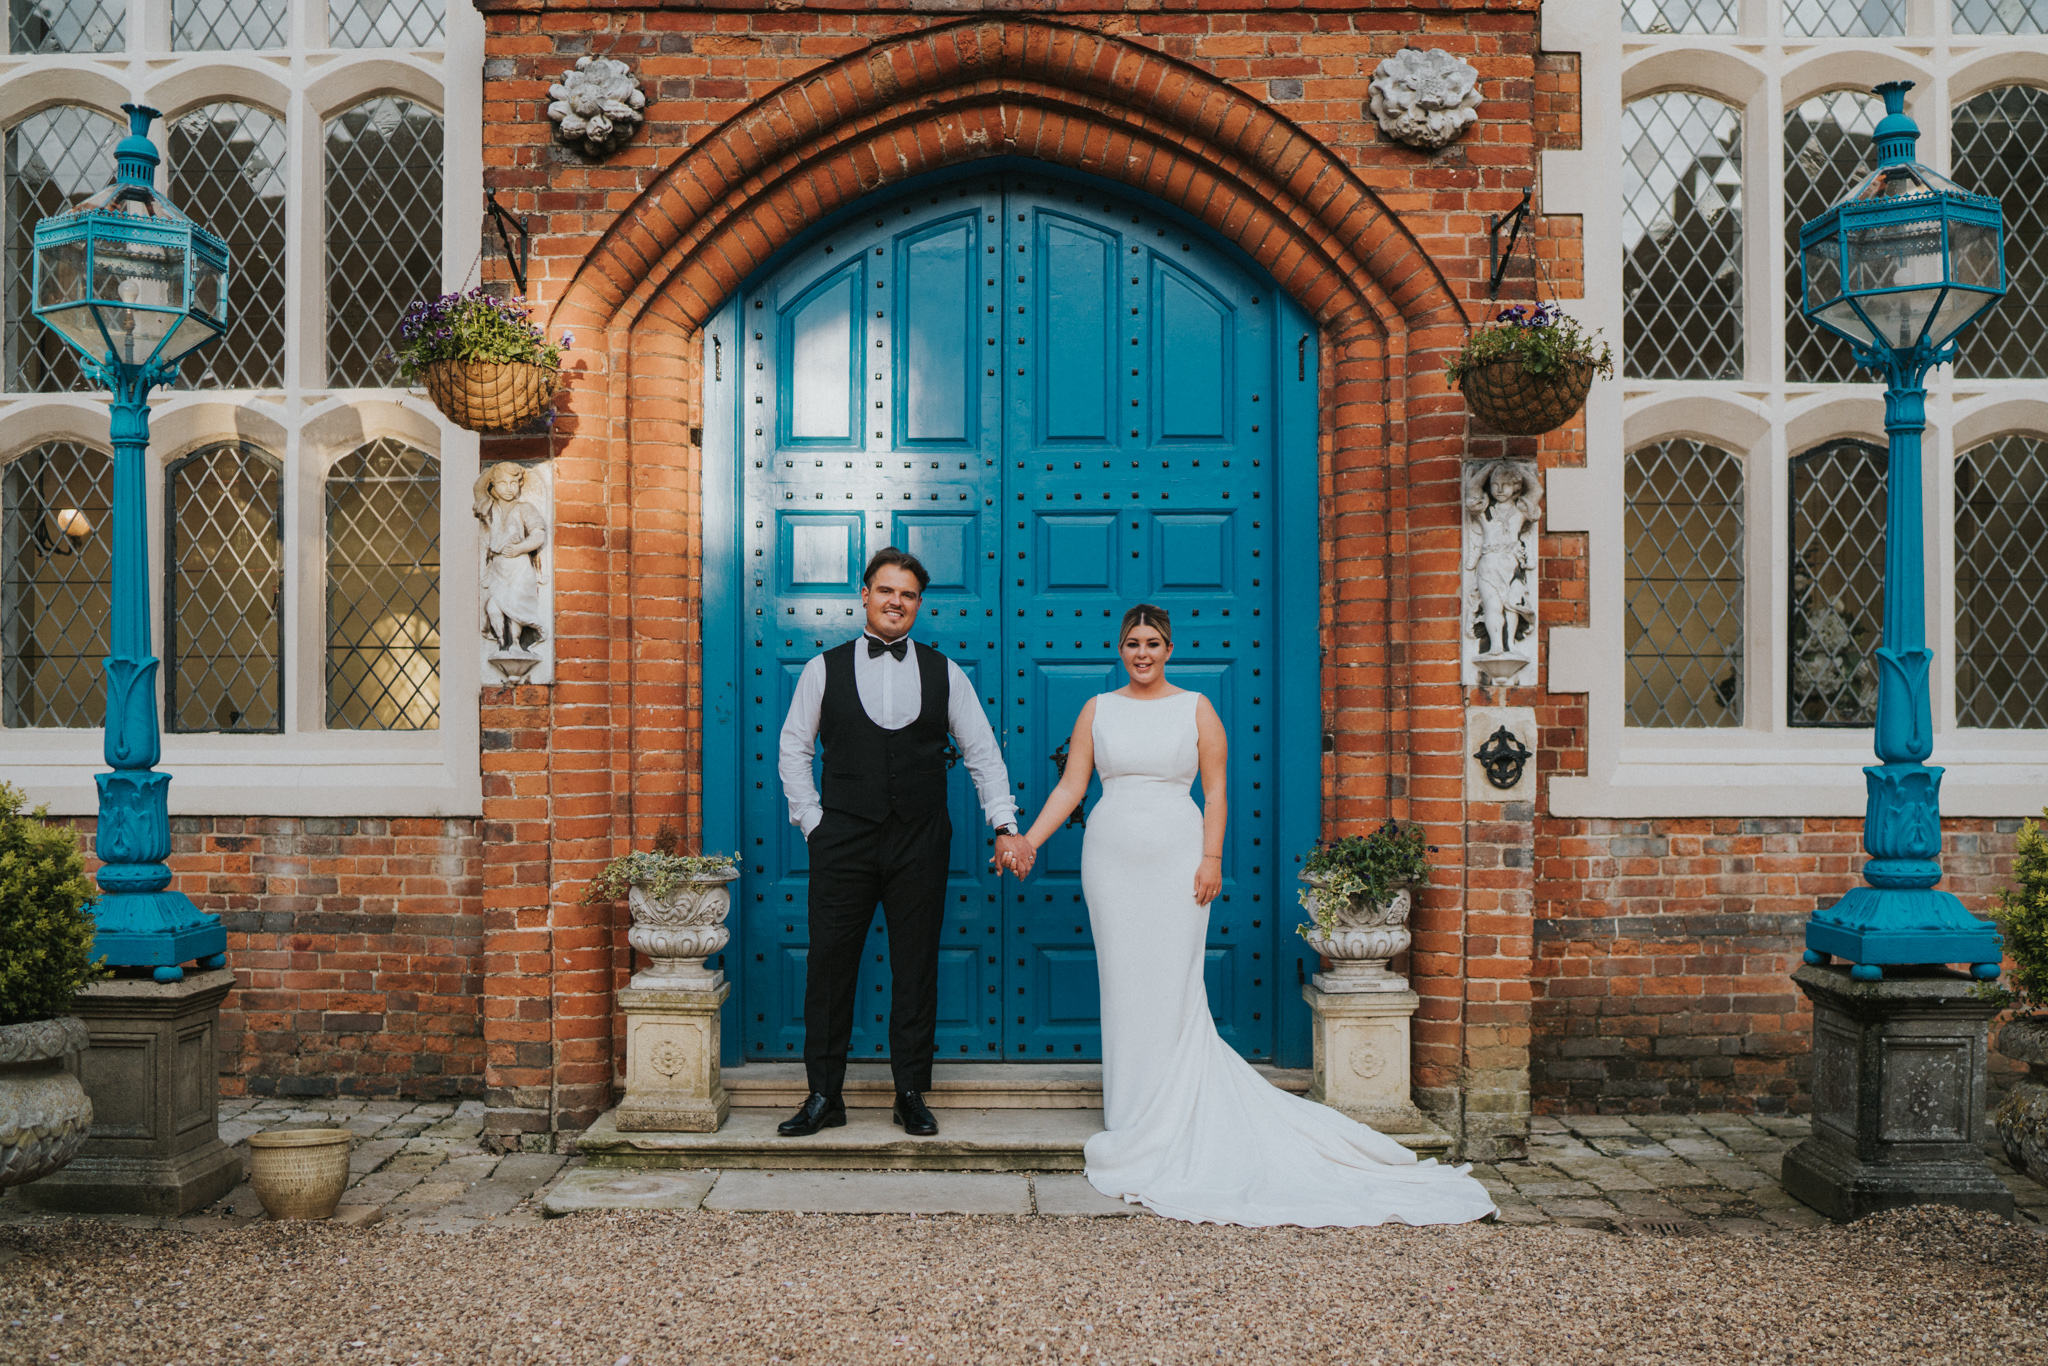 chloe-dan-gosfield-hall-wedding-photographer-grace-elizabeth-colchester-essex-alternative-wedding-photographer-suffolk-norfolk-devon (33 of 41).jpg